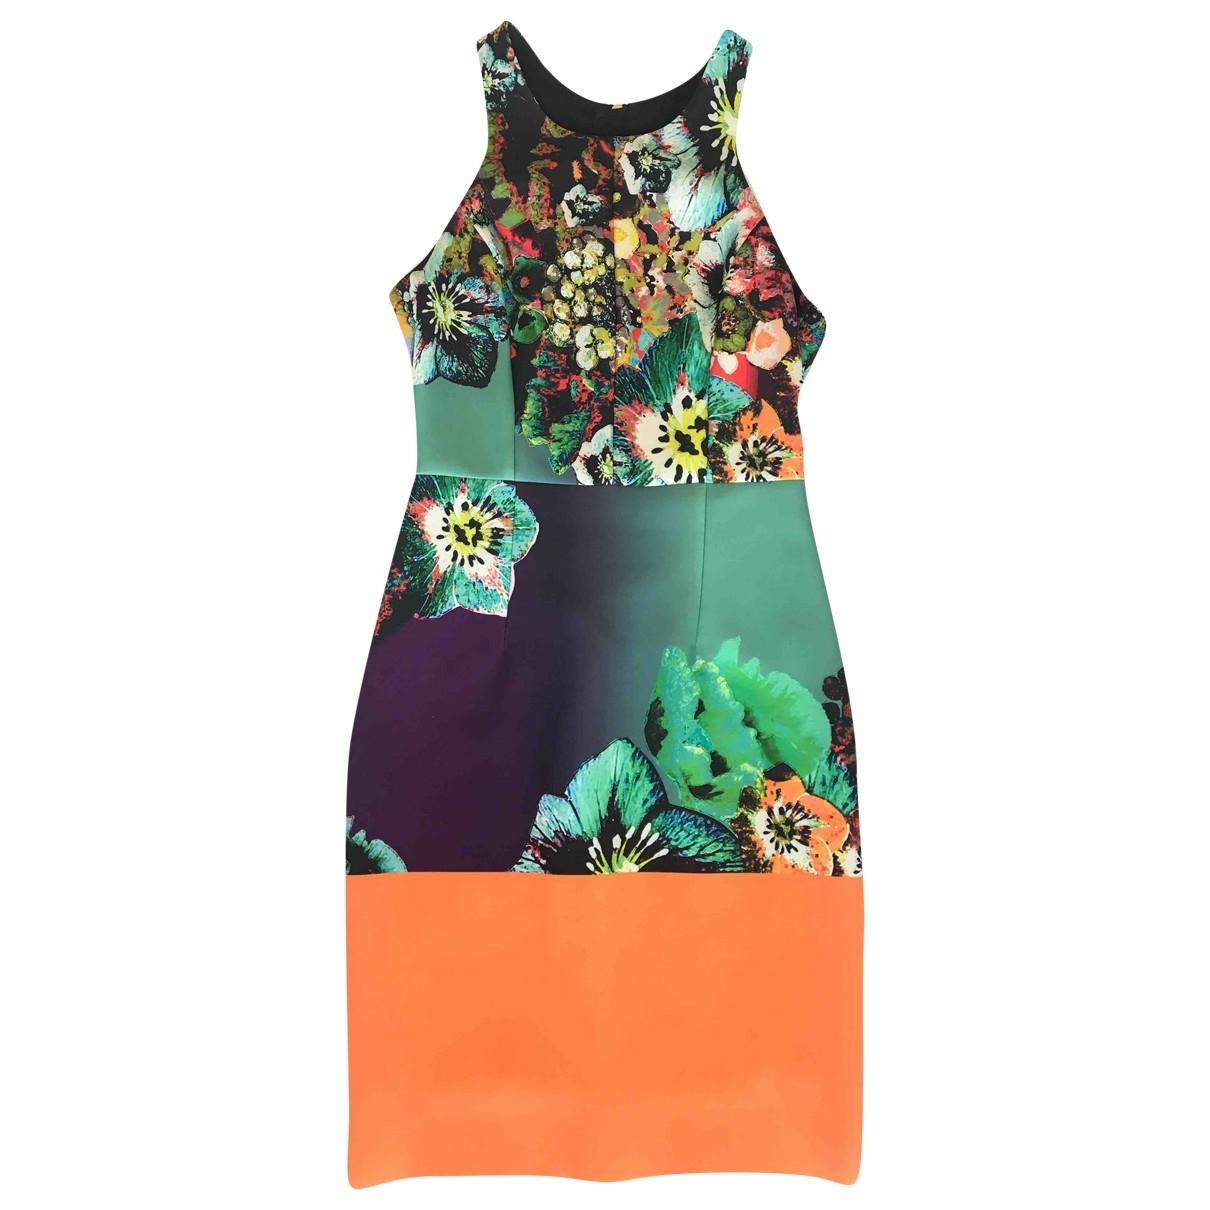 Milly \N Multicolour dress for Women 6 US